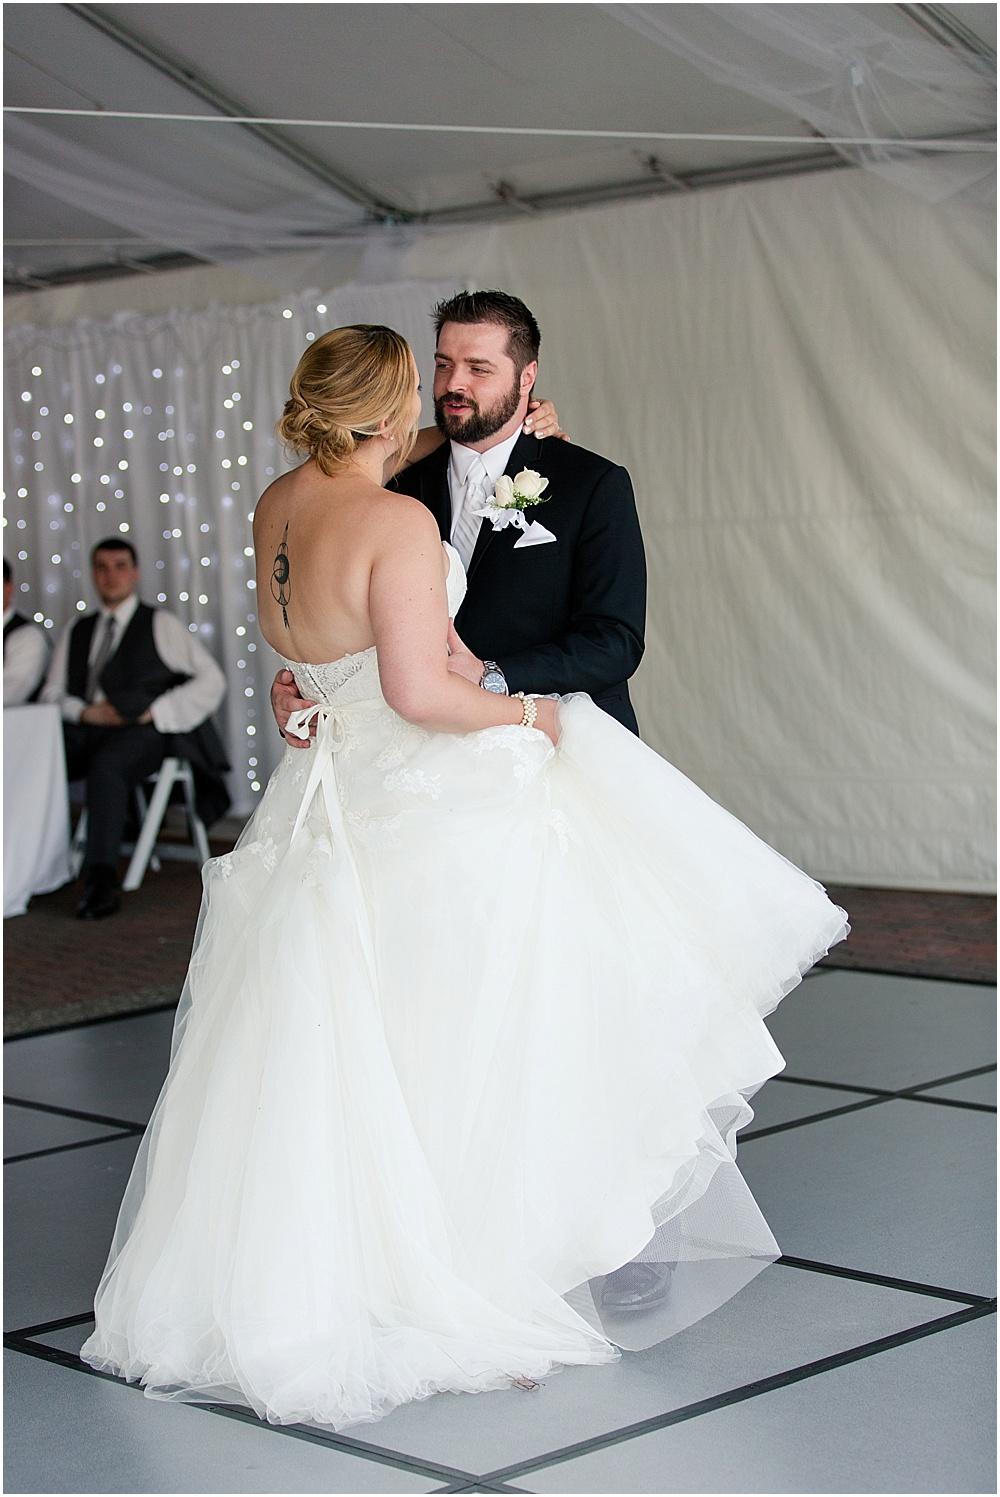 mitzner_silverdale_beach_hotel_wedding_silverdale_washington_pacific_northwest_wedding_photographer_0107